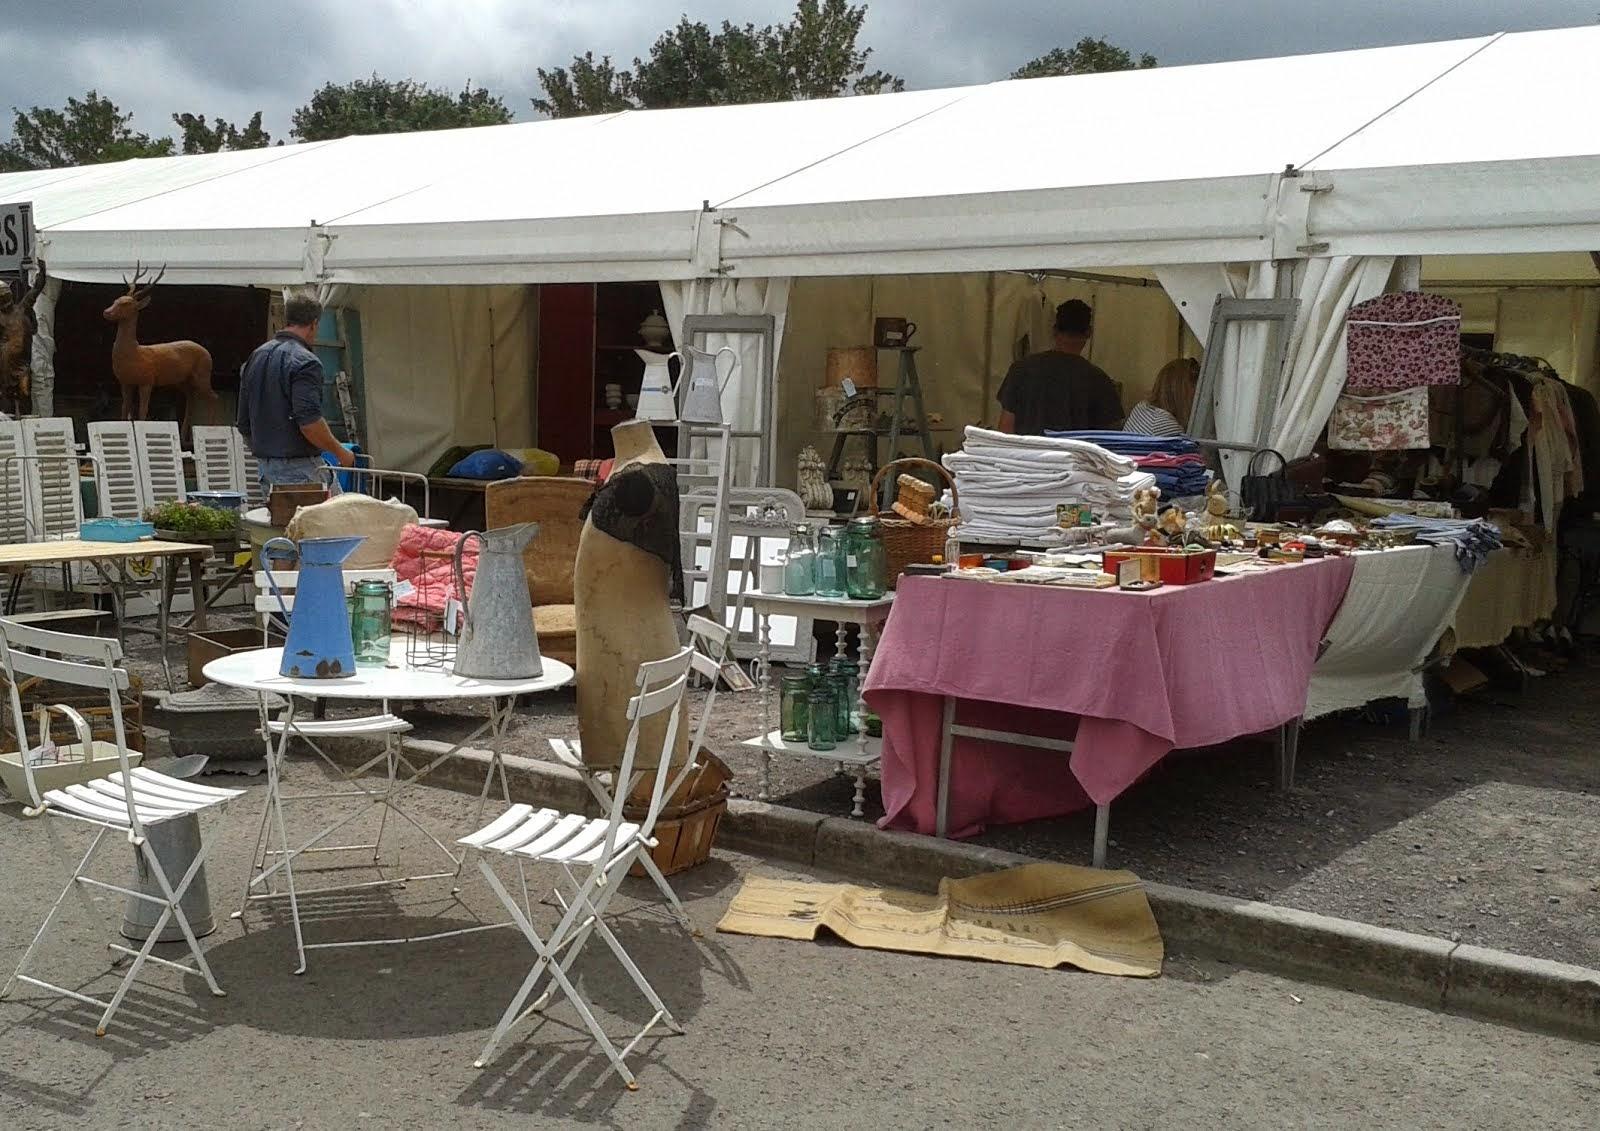 Shepton Mallet iacf Antiques Fair